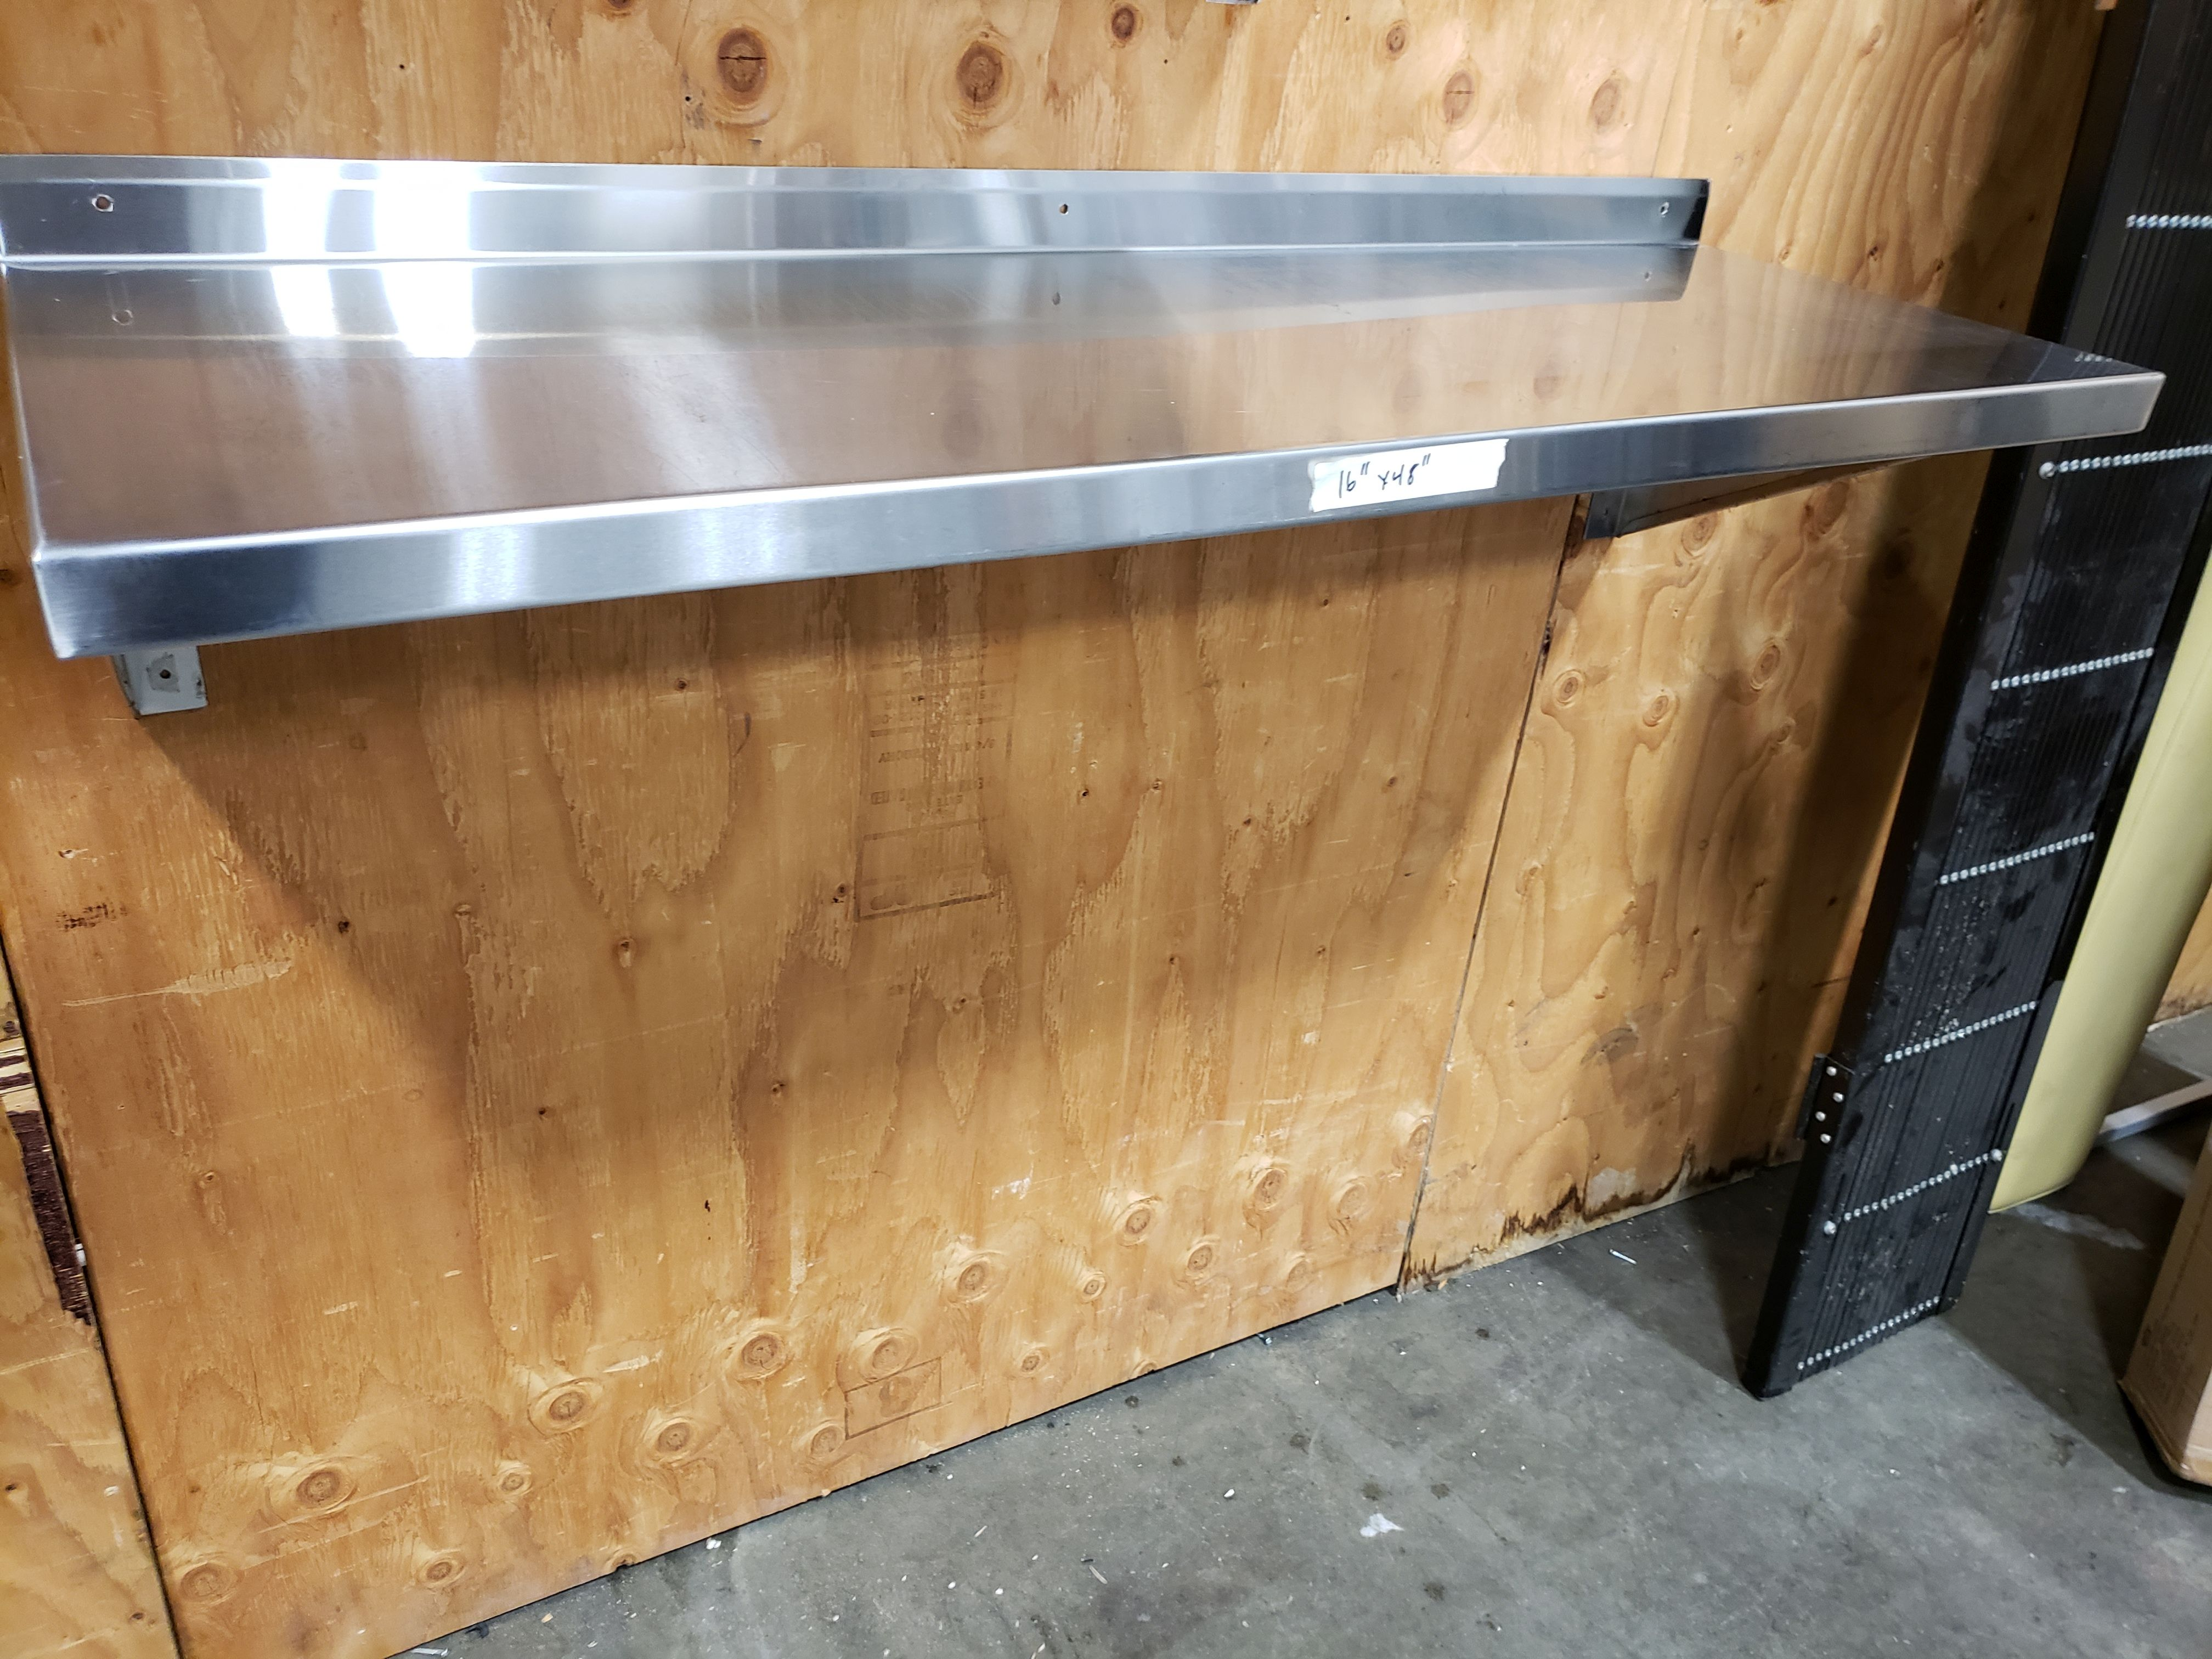 "Lot 22 - 16"" x 48"" Stainless Steel Wall Shelf"